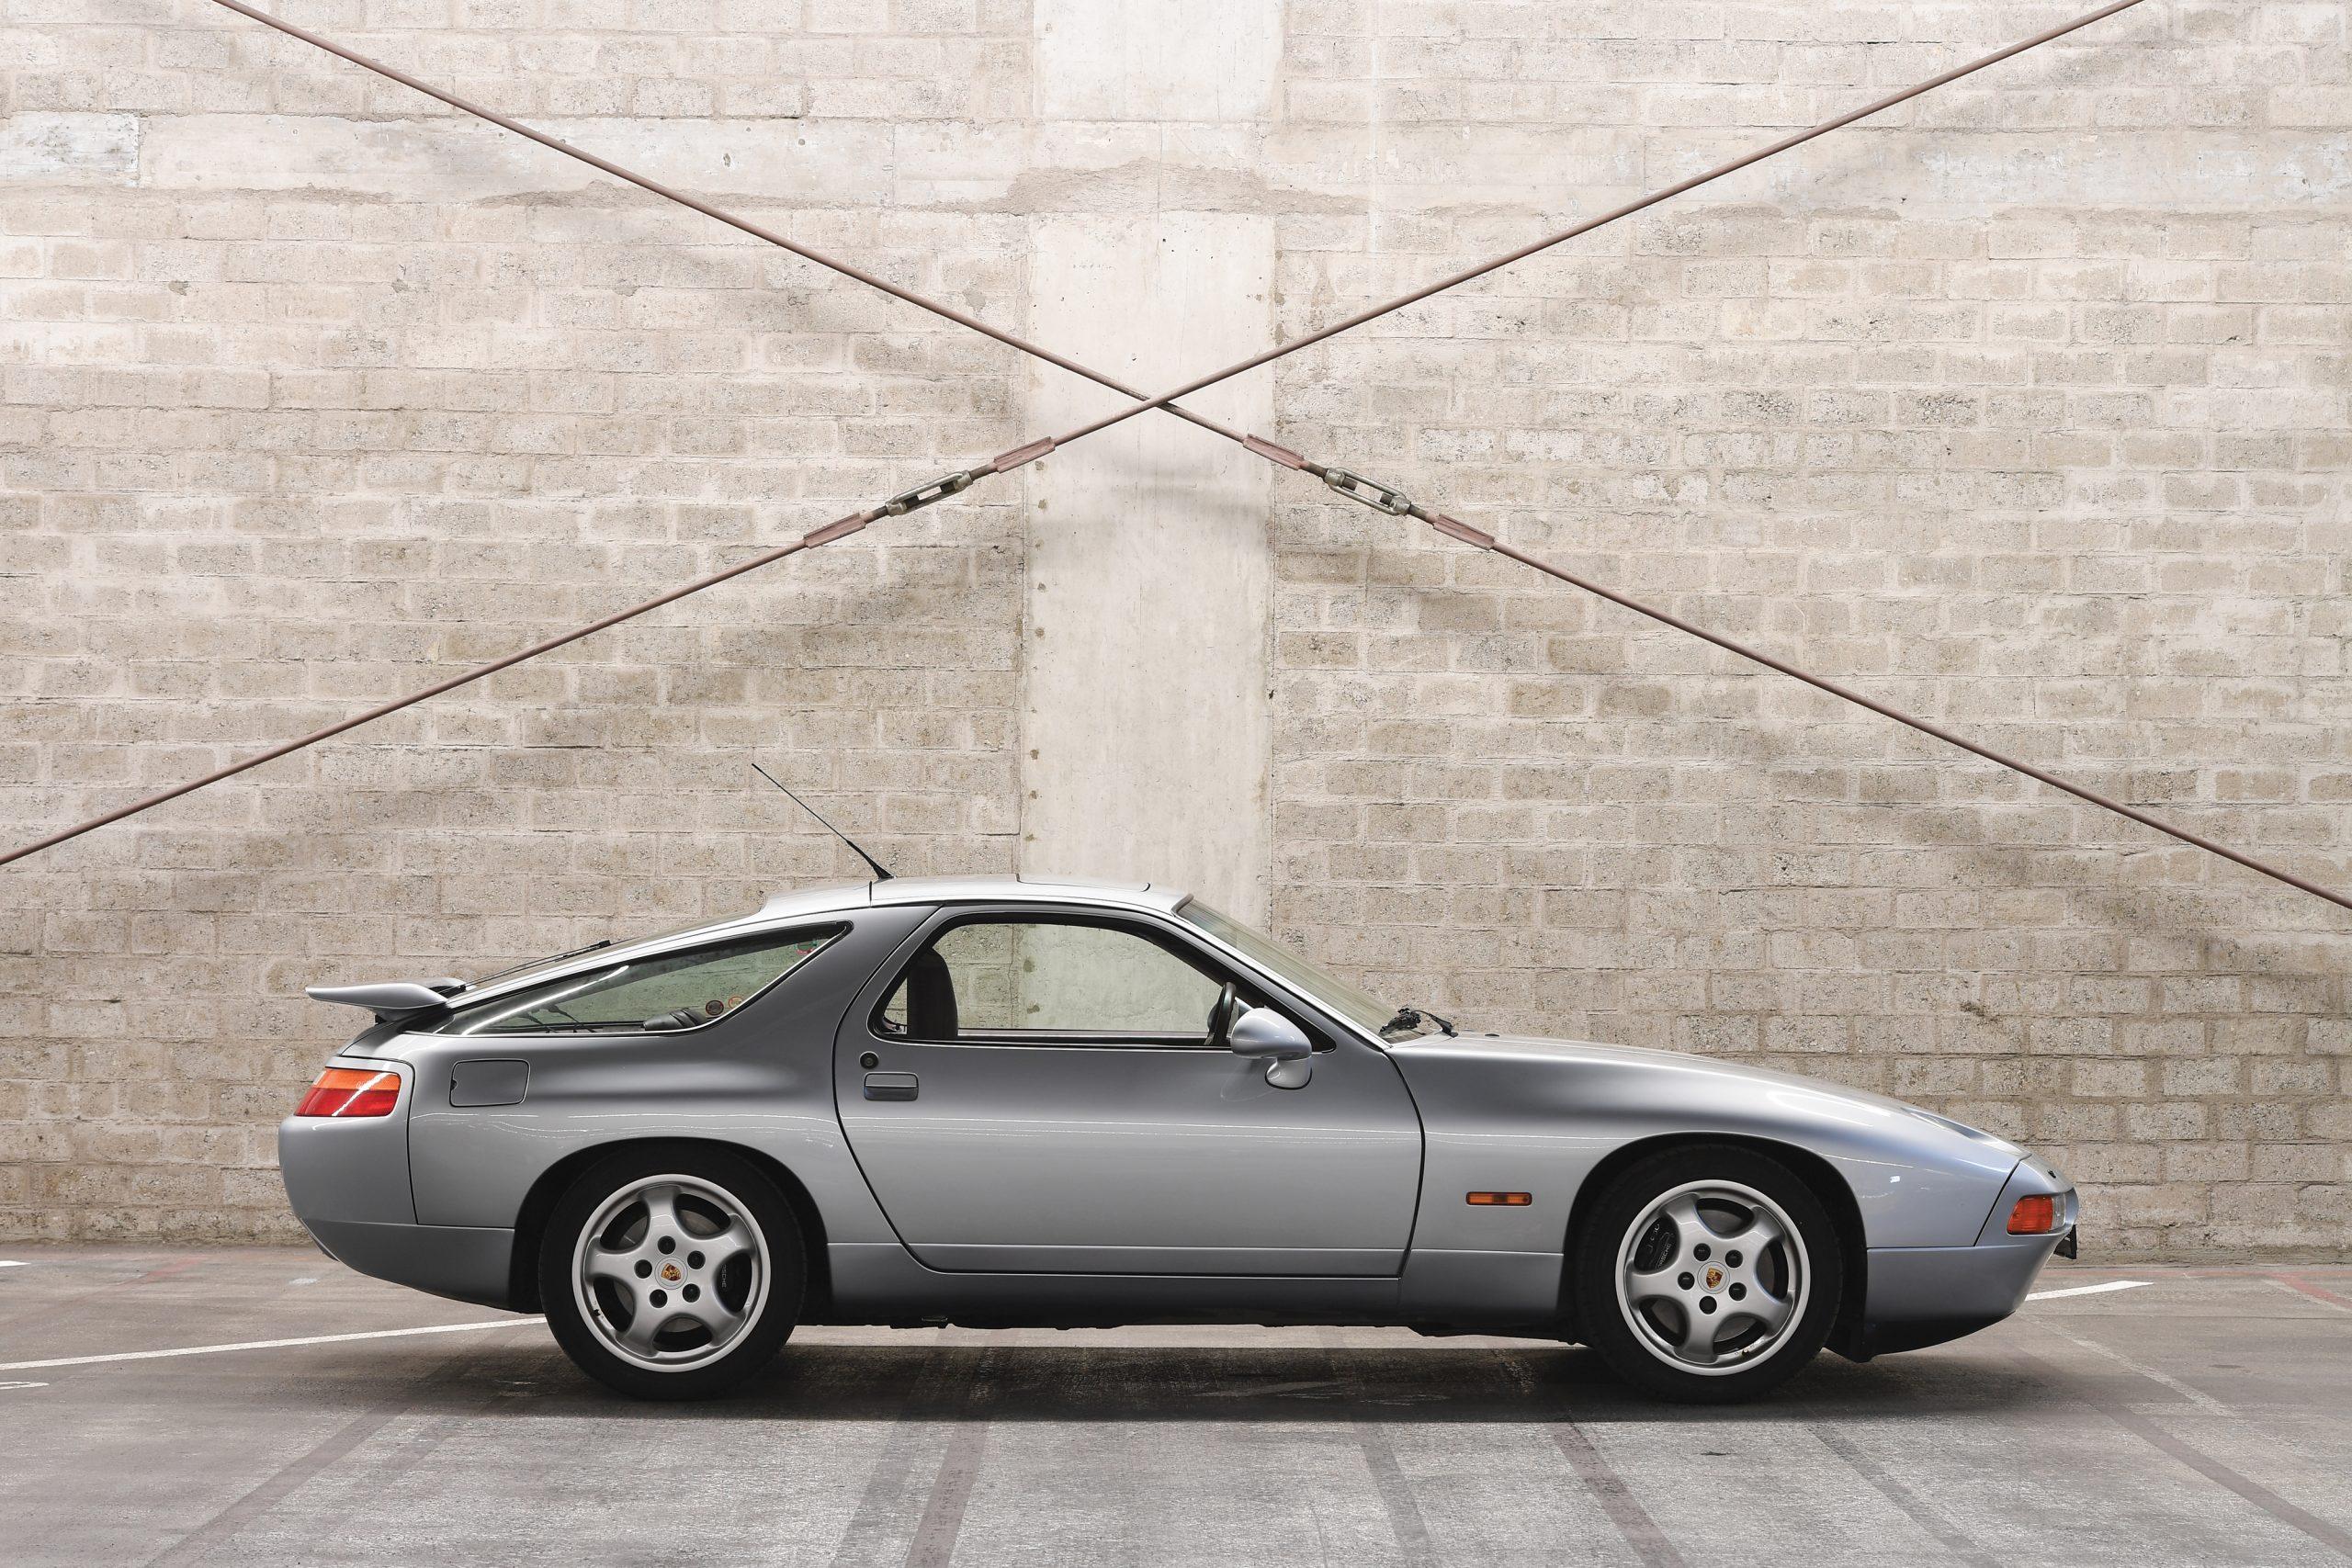 1992 Porsche 928 GTS Side Profile